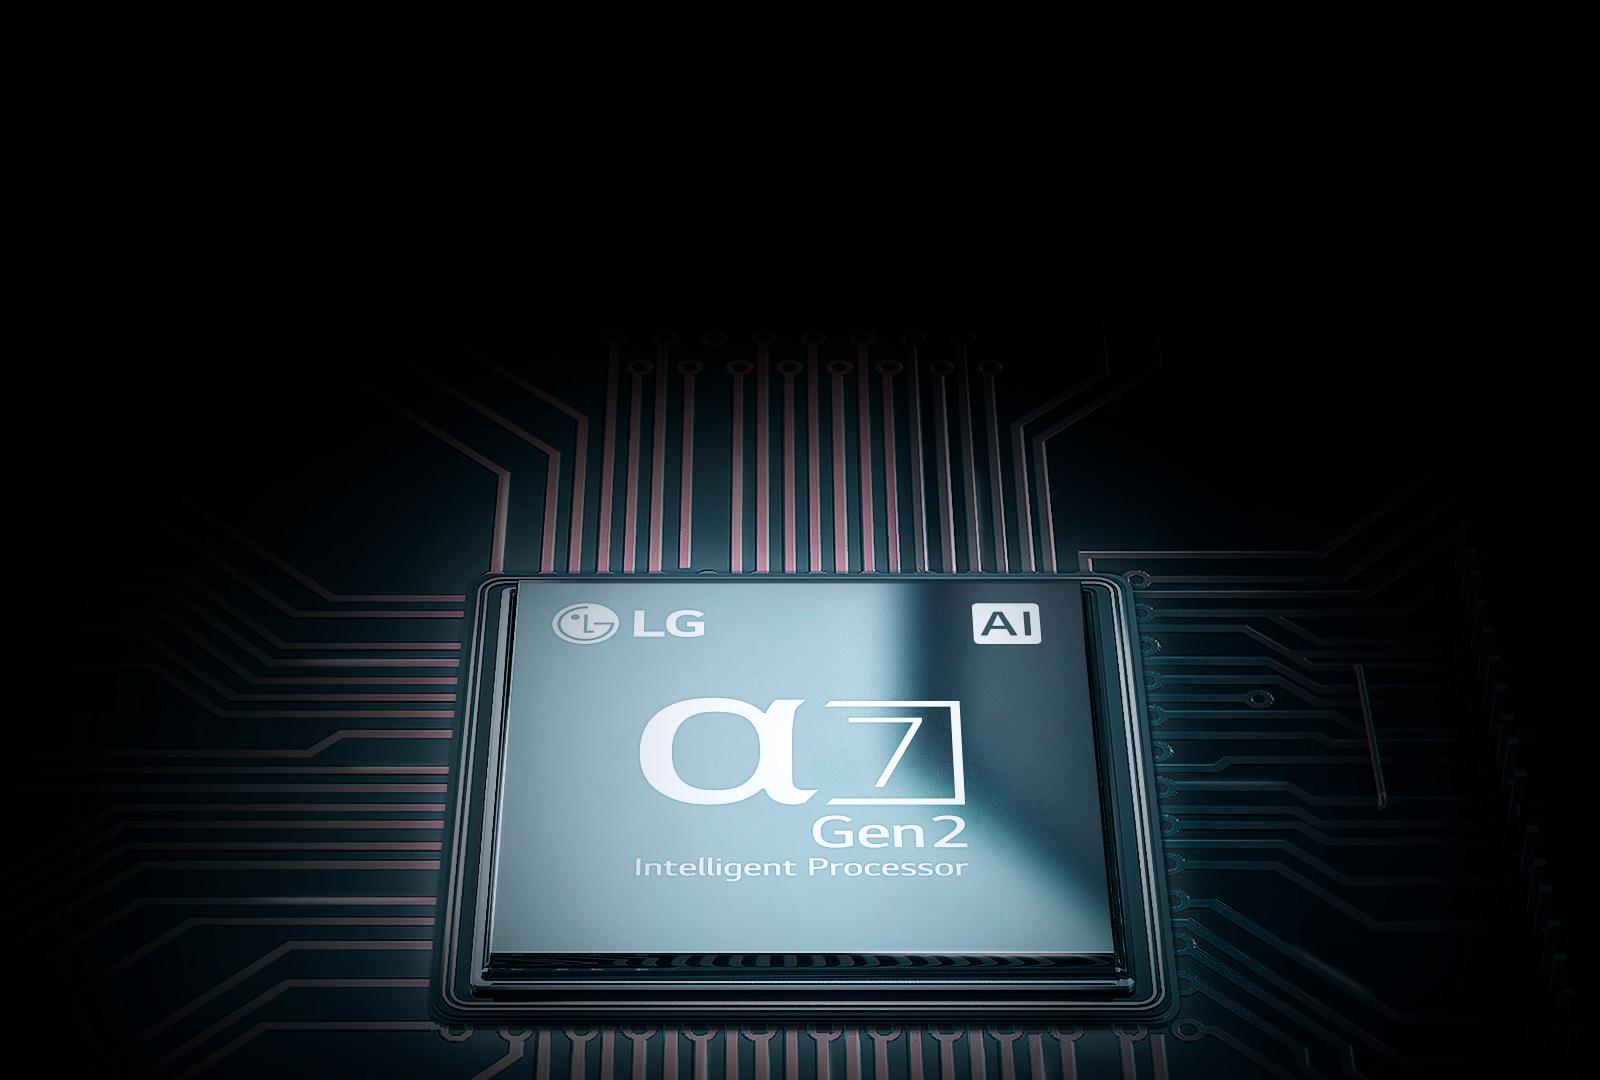 تلویزیون 65 اینچ ال جی مدل SM9500_ تلویزیون هوشمند65 اینچ LG